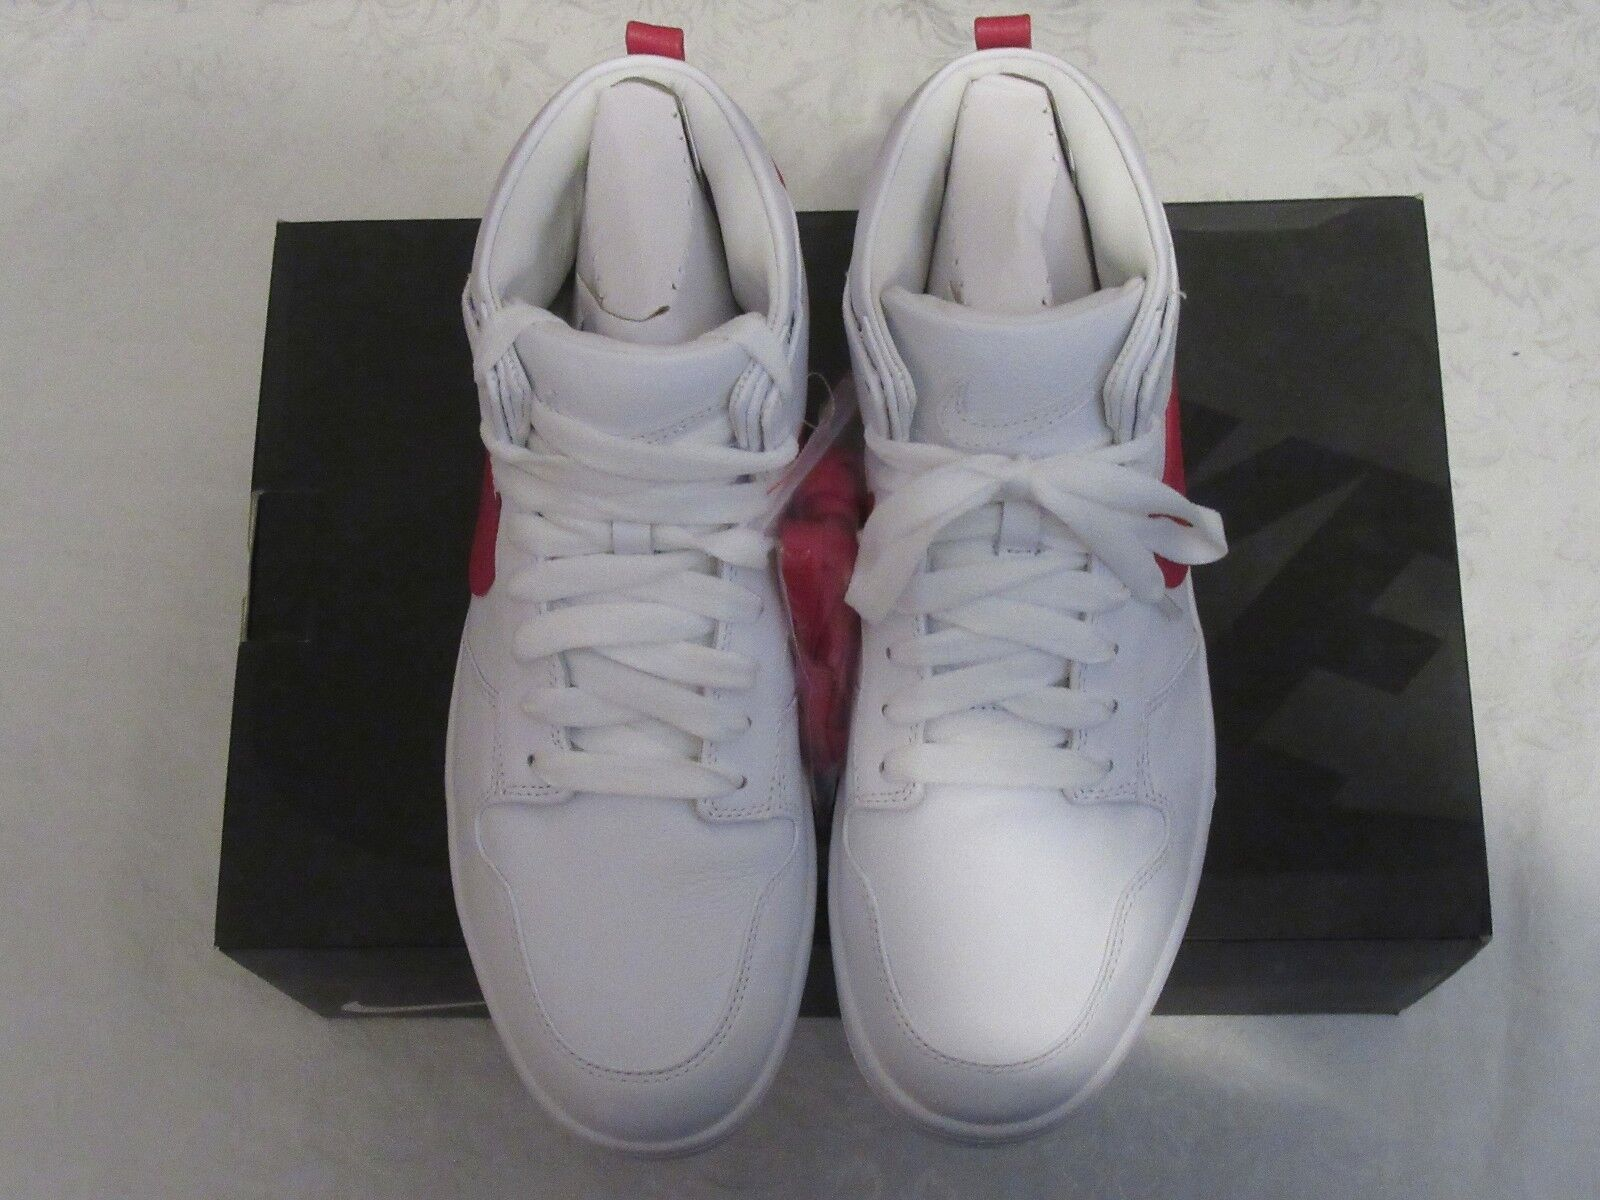 8cd20bea07 Nike Lux Chukka RT Riccardo Tisci Red White white red 100 Size 11 910088  Dunk nqbgtj2422-Athletic Shoes